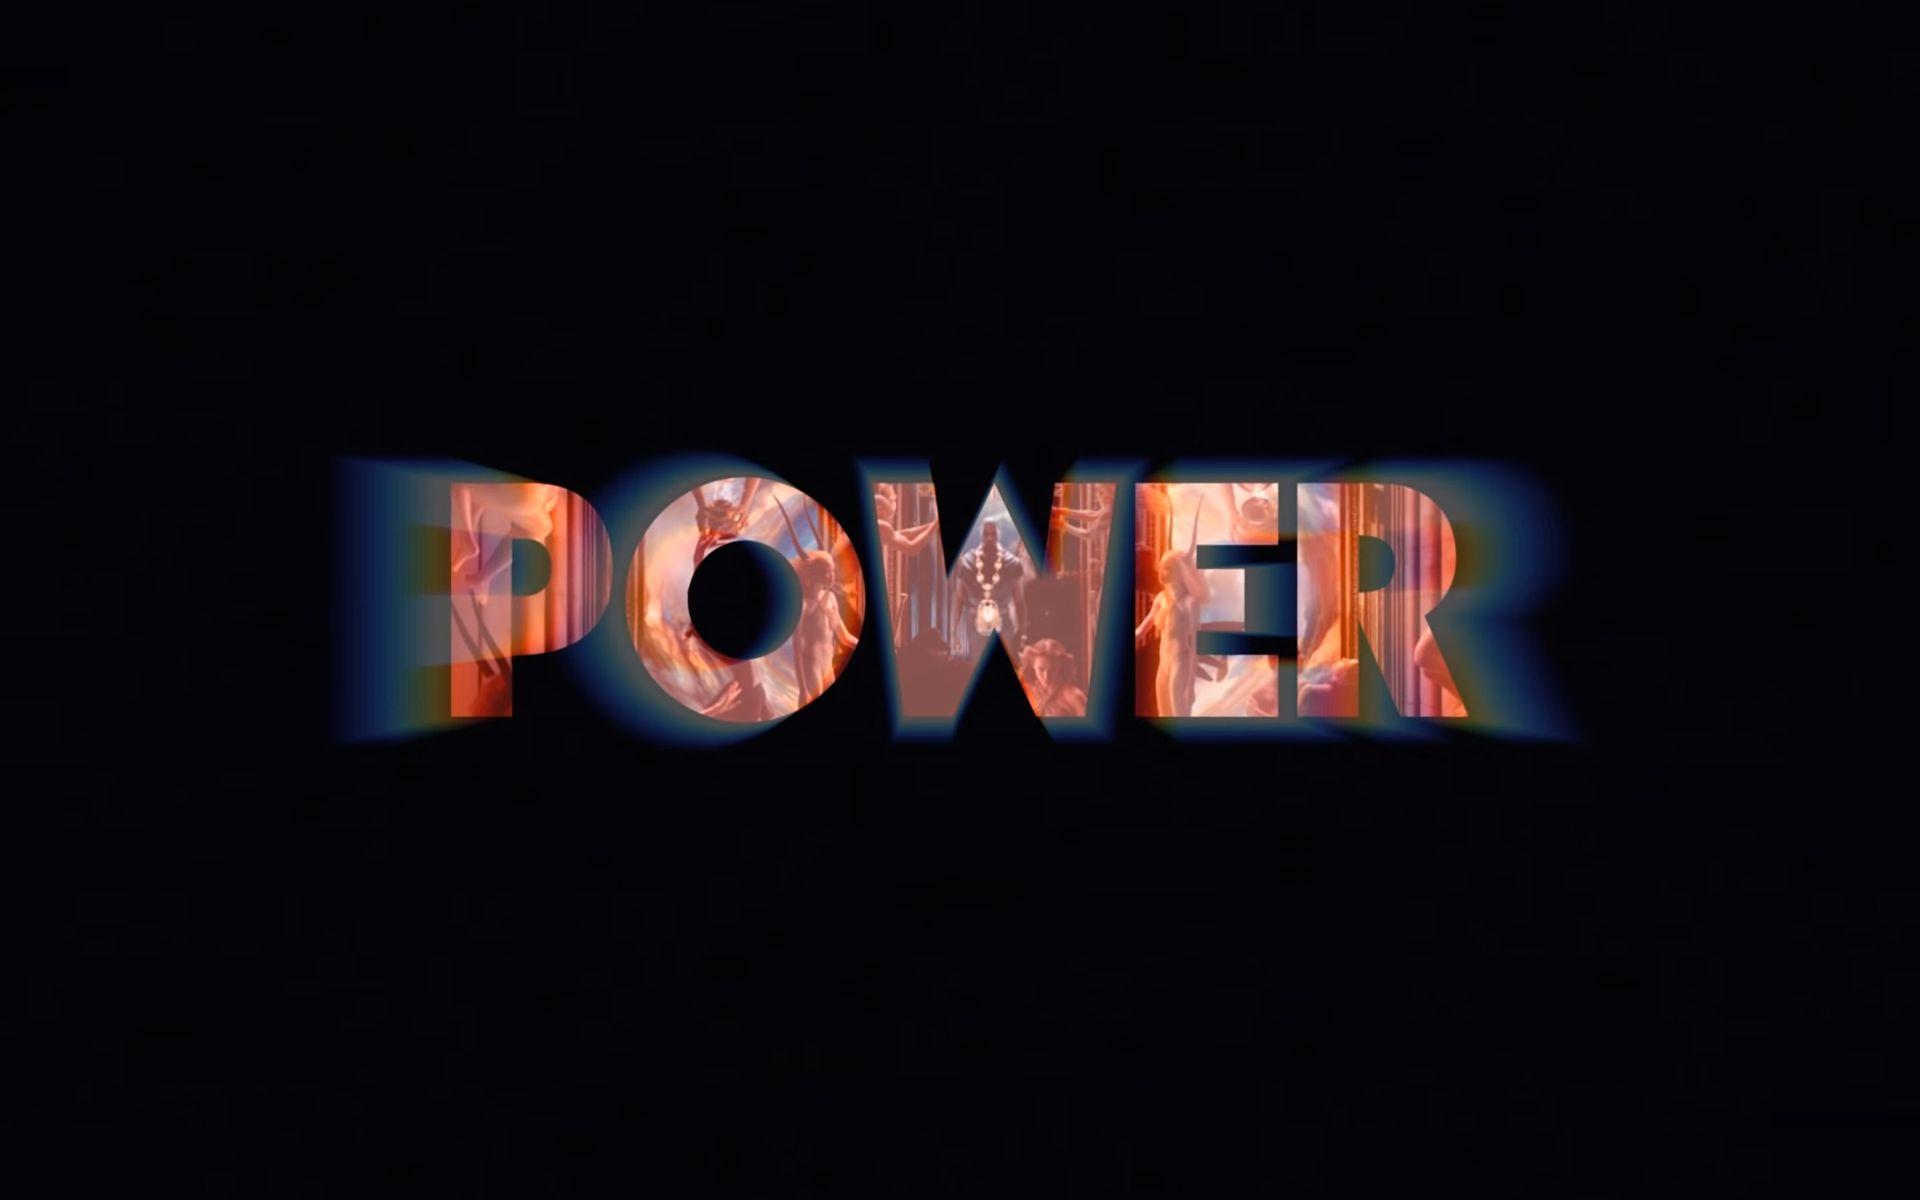 Kanye West Power In 2020 Kanye West Power Kanye West Kanye